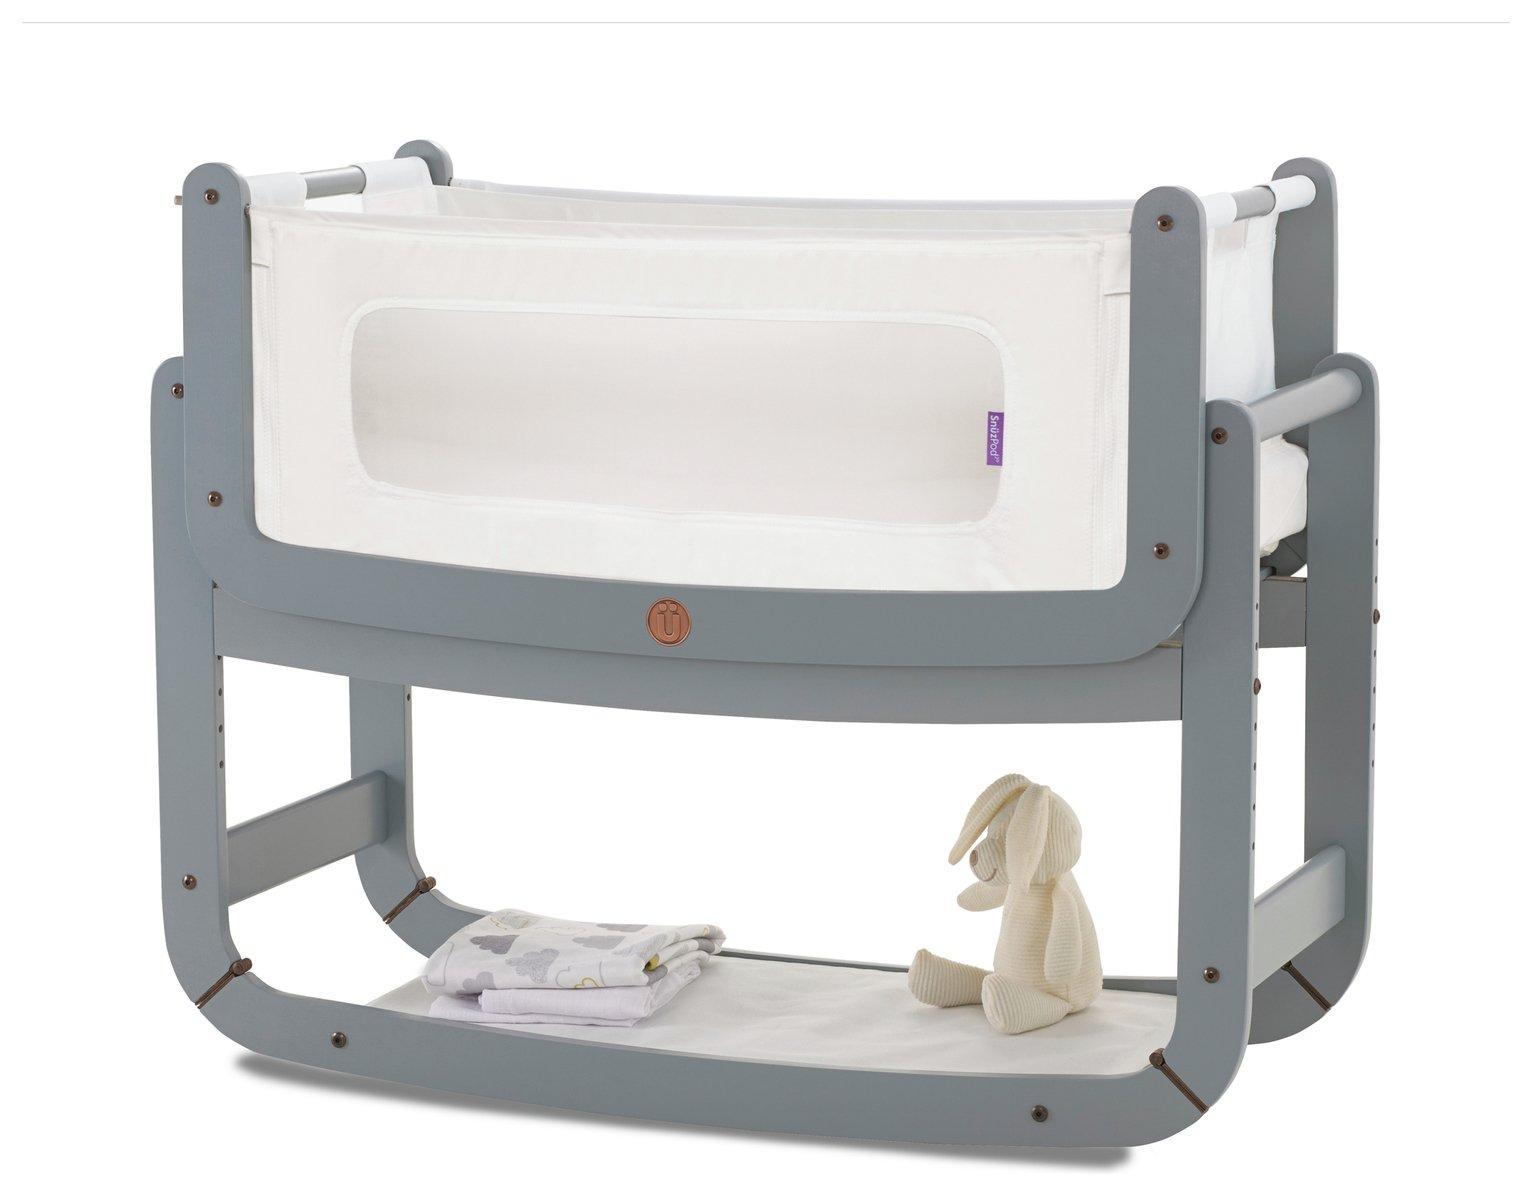 Image of Snuzpod 3 in 1 Bedside Crib - Dove Grey